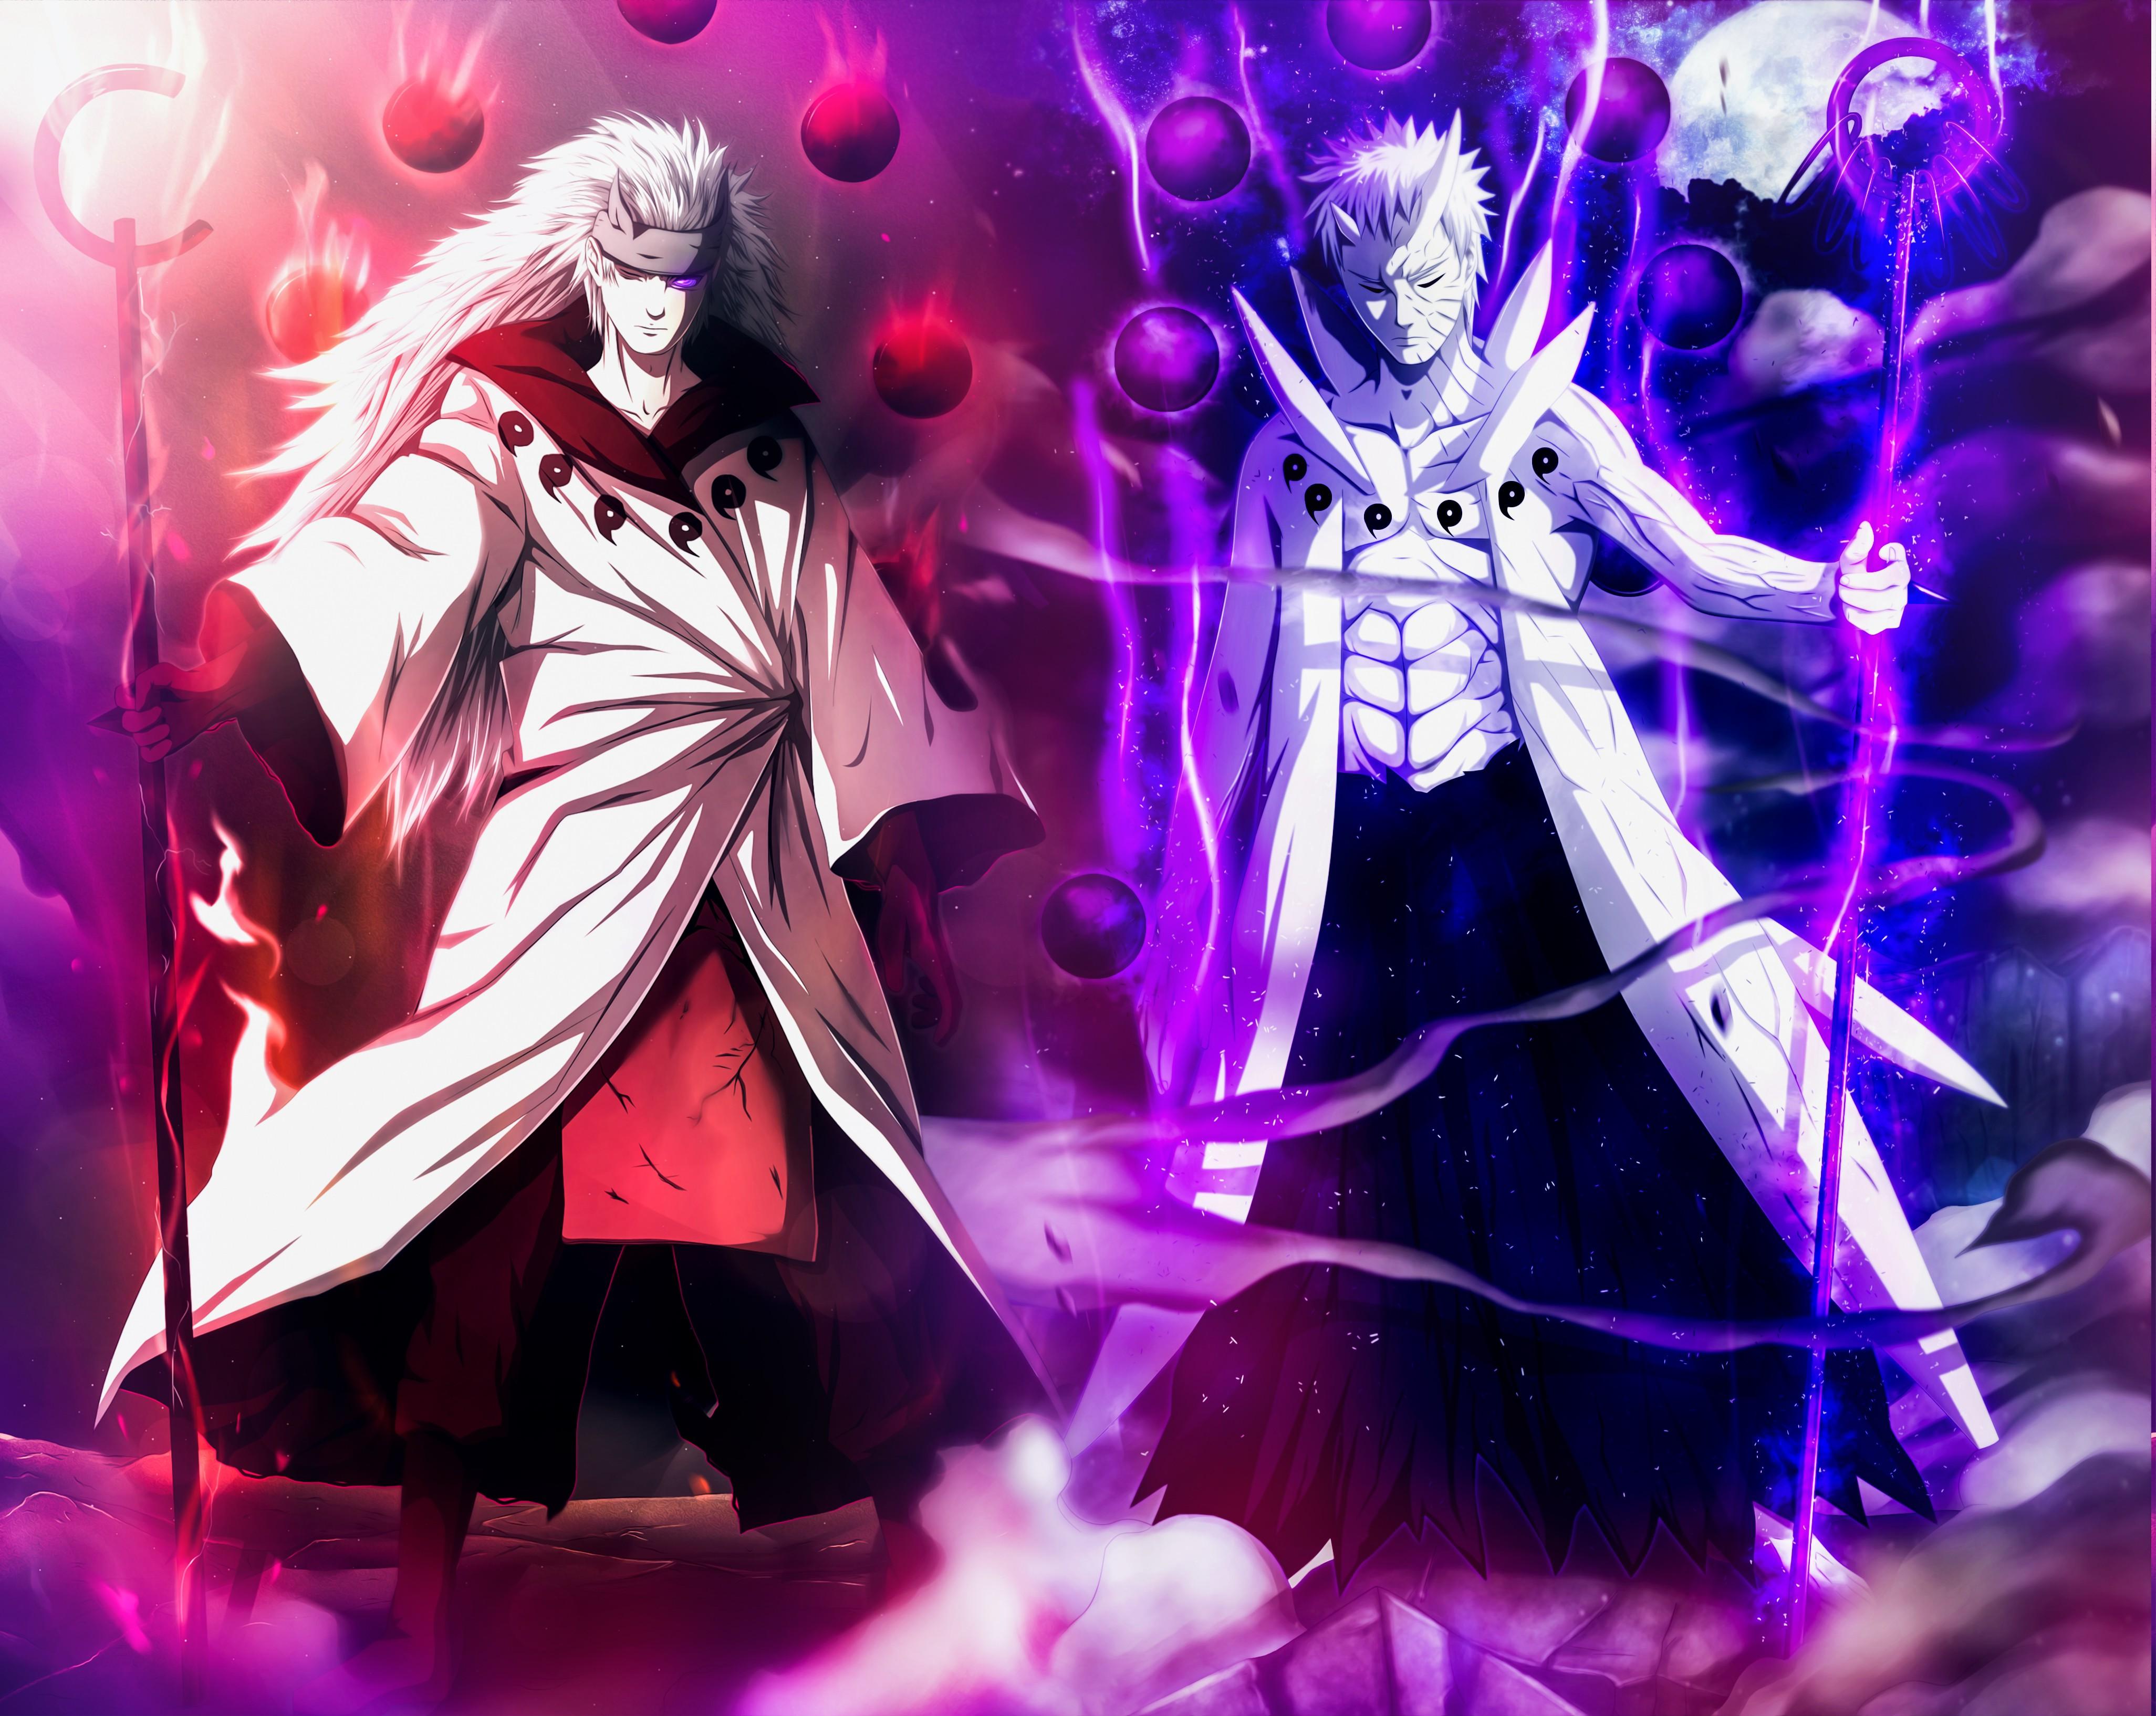 4105x3268 px anime Naruto Shippuuden Uchiha Madara Uchiha Obito 1108023